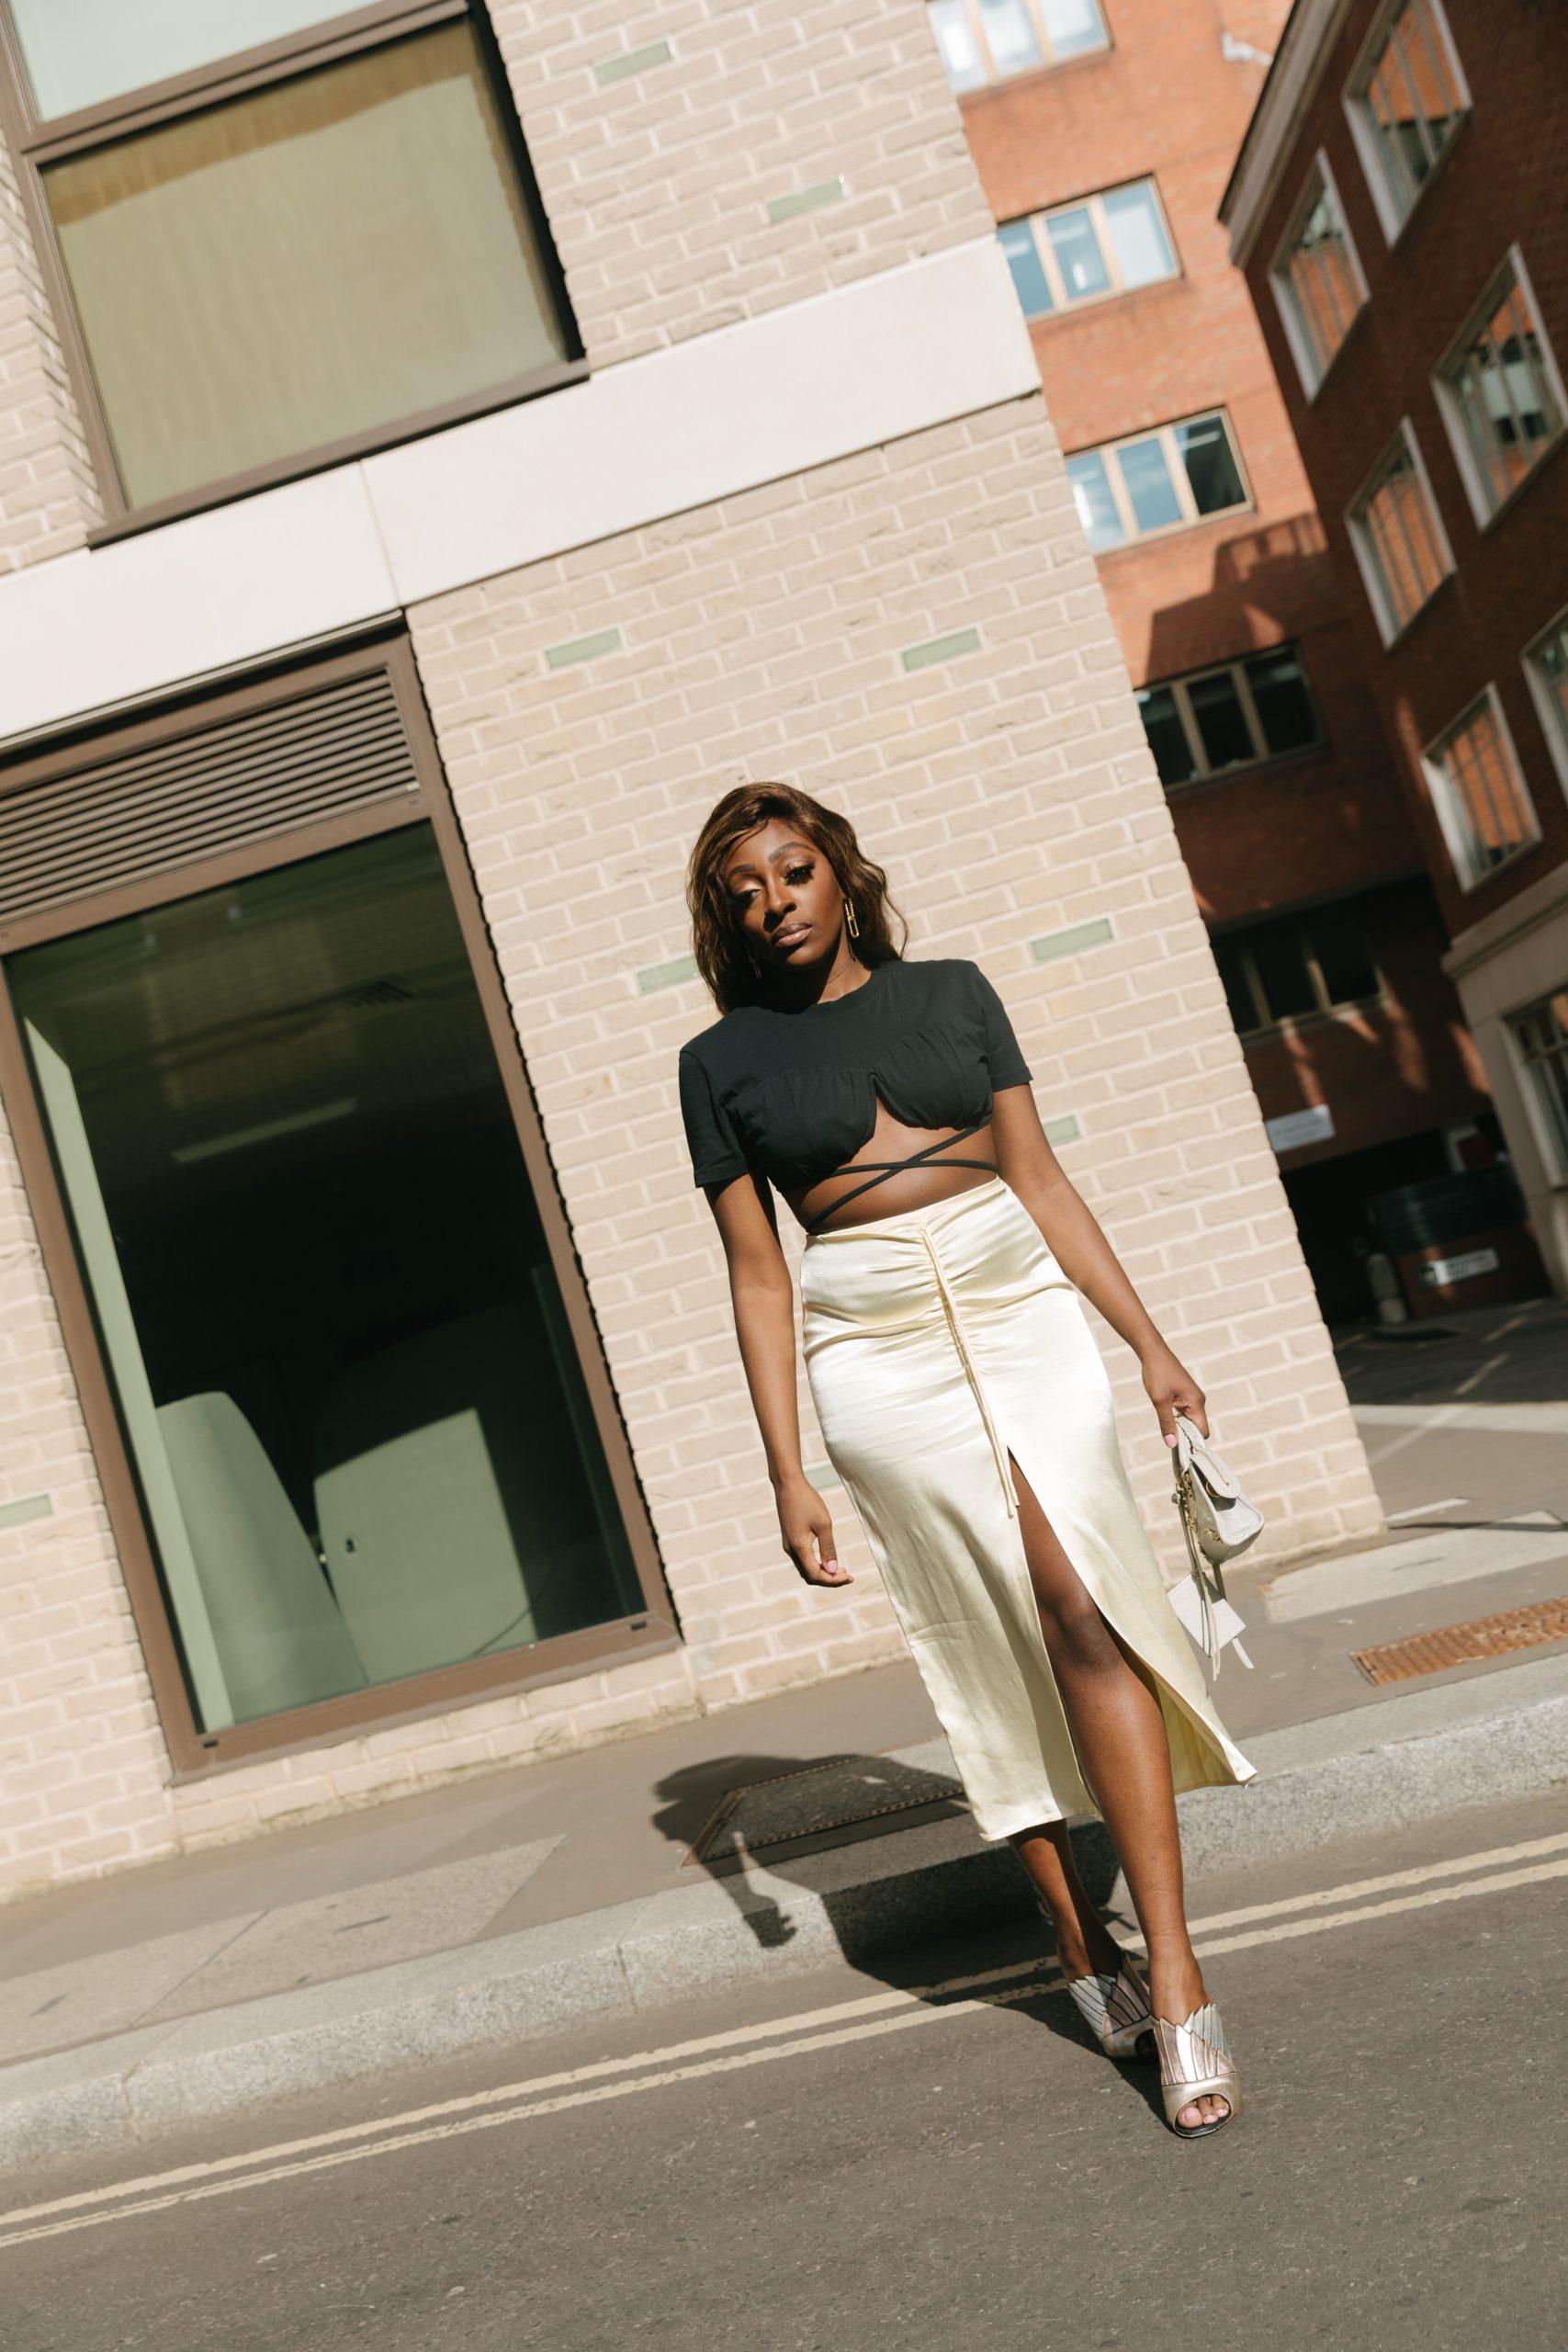 Jacquemus T-Shirt and Crop Top - Zara Satin midi skirt - Balenciaga mini city bag - walking - Tasha Antwi